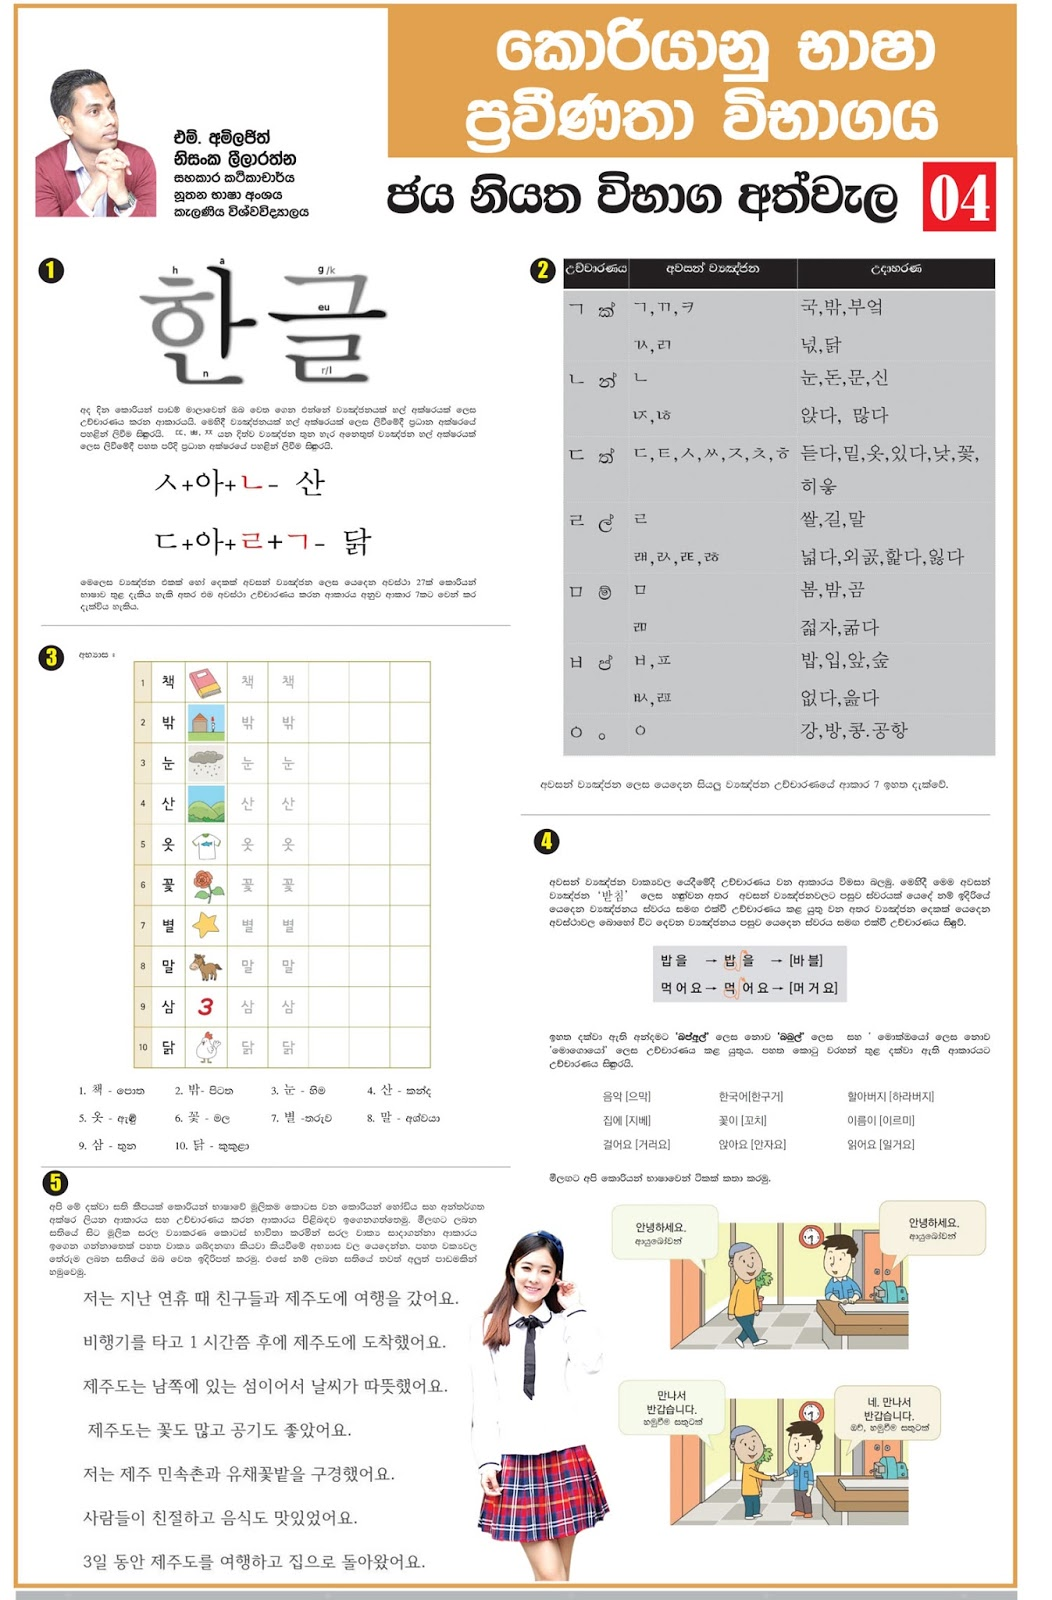 korean language exam 2017 in sri lanka - IQLANKA COM